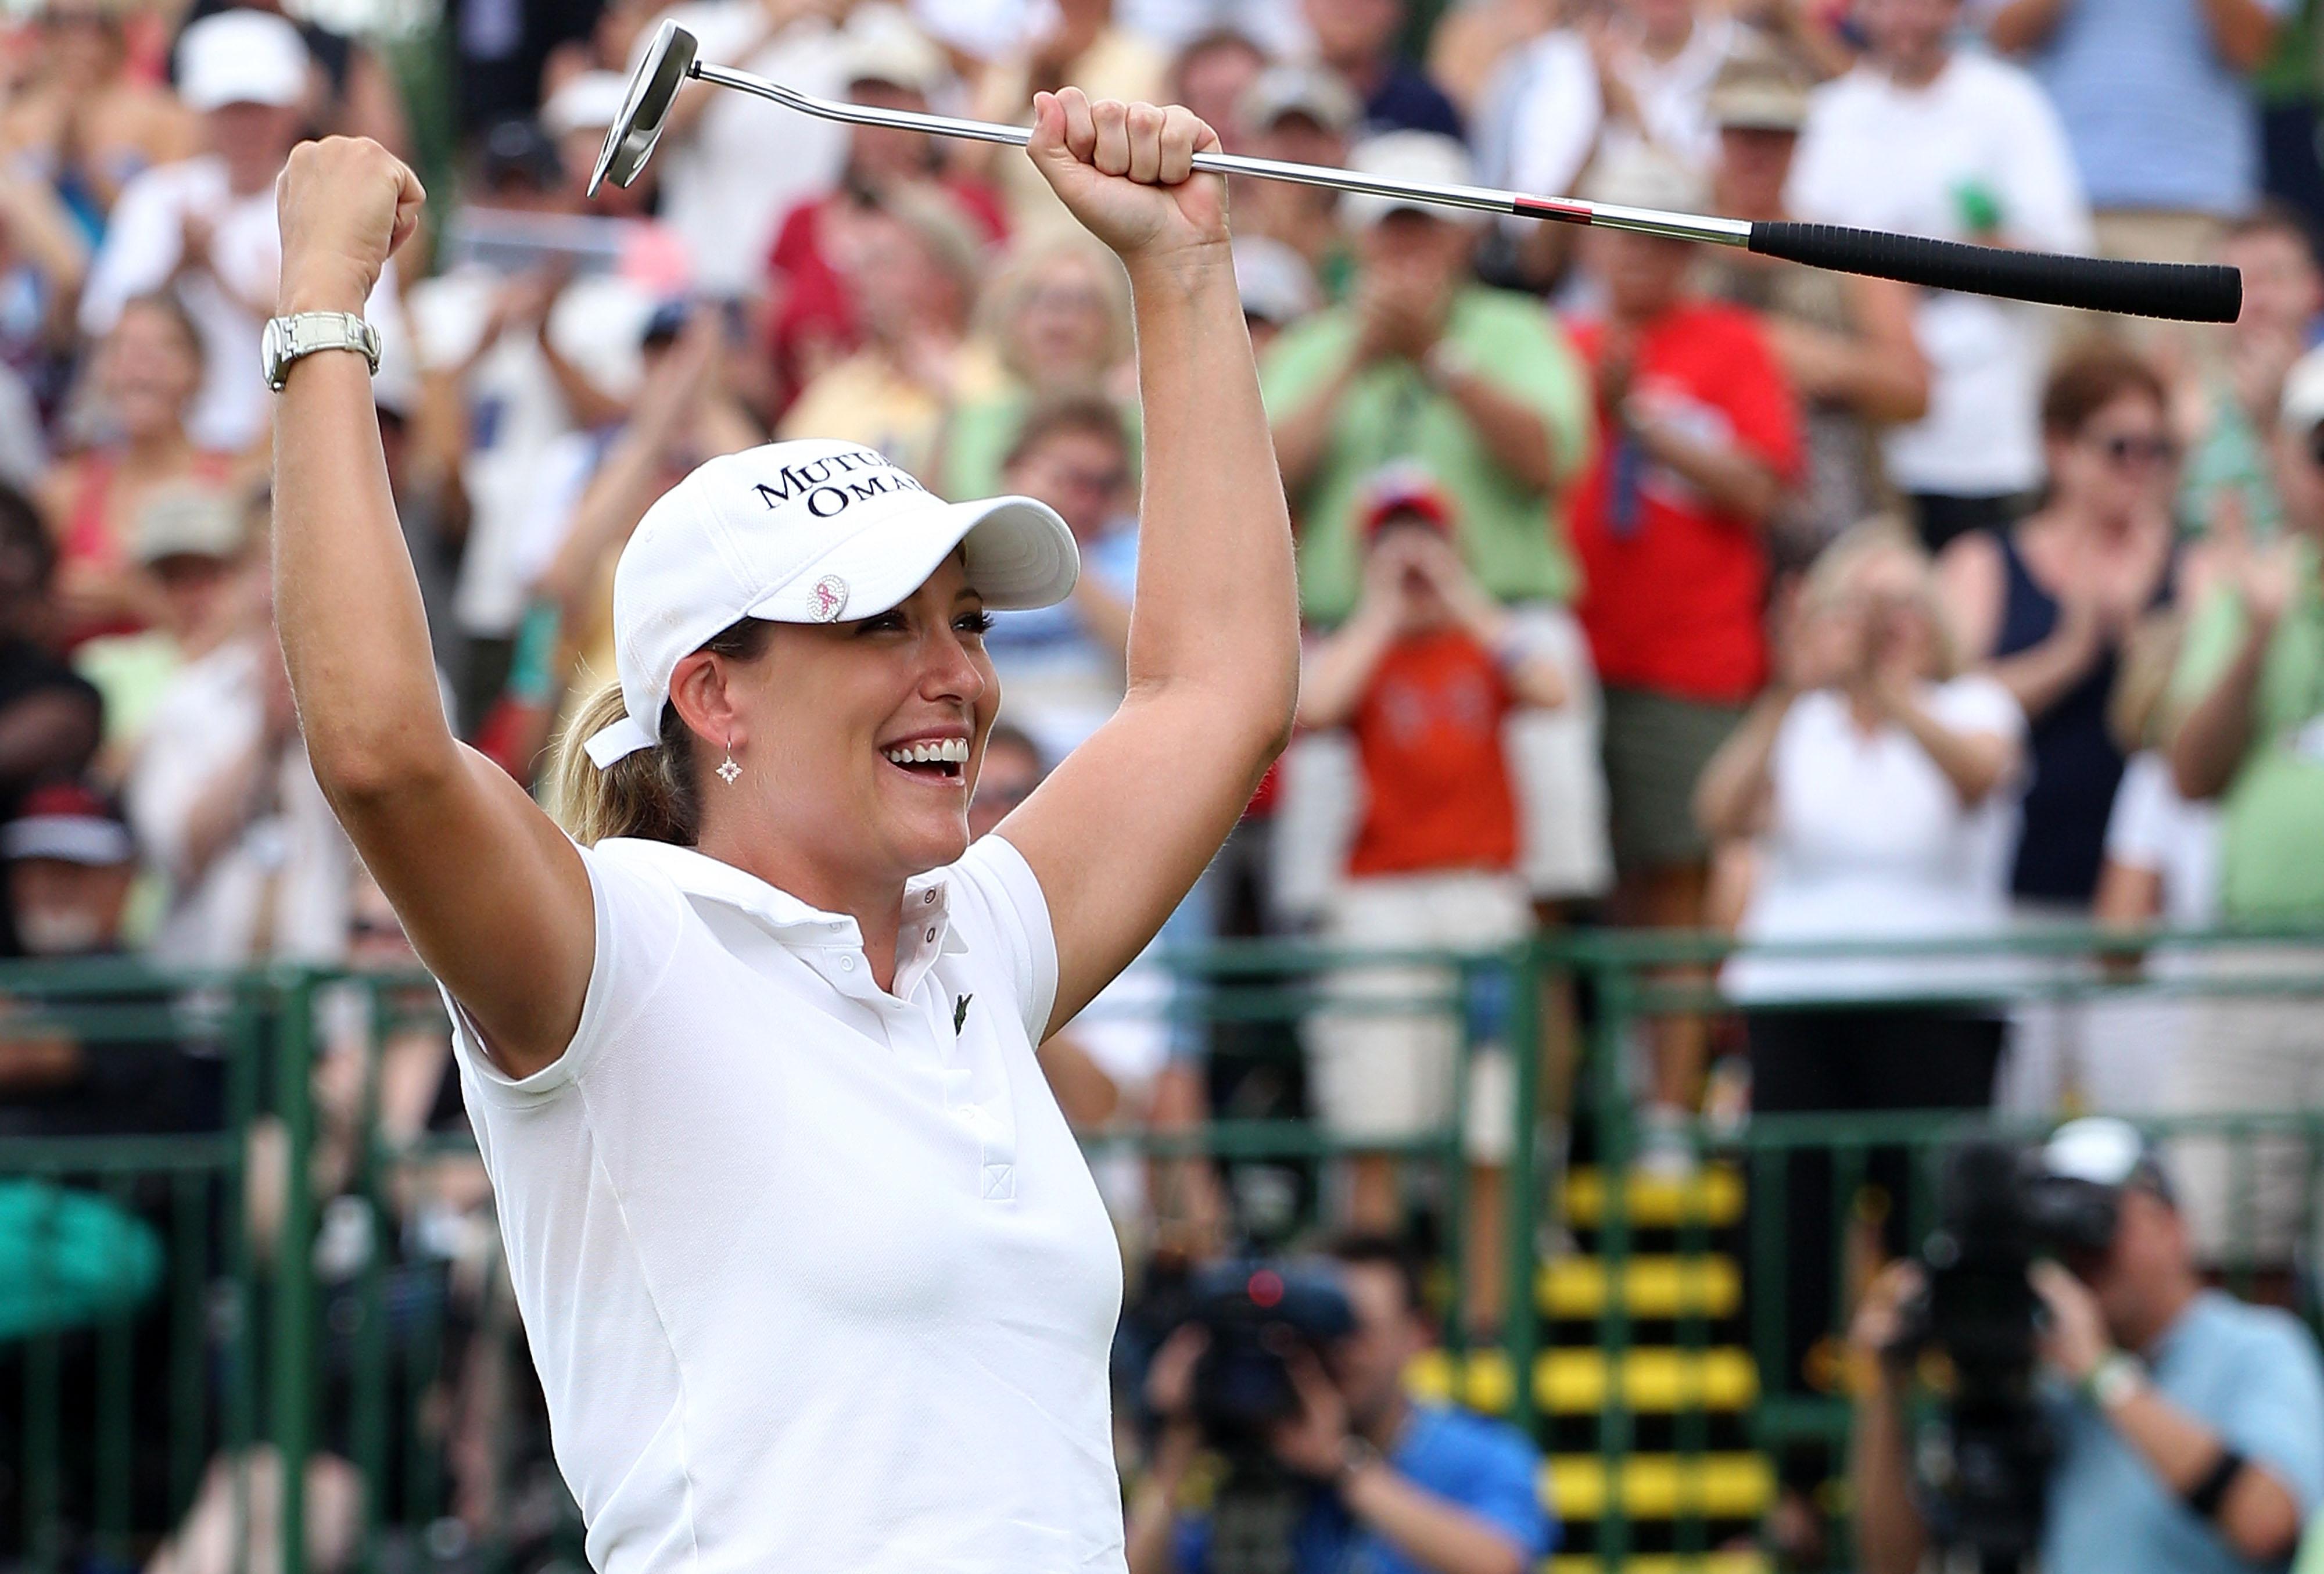 Cristie Kerr wins 2010 LPGA Championship by 12 shots